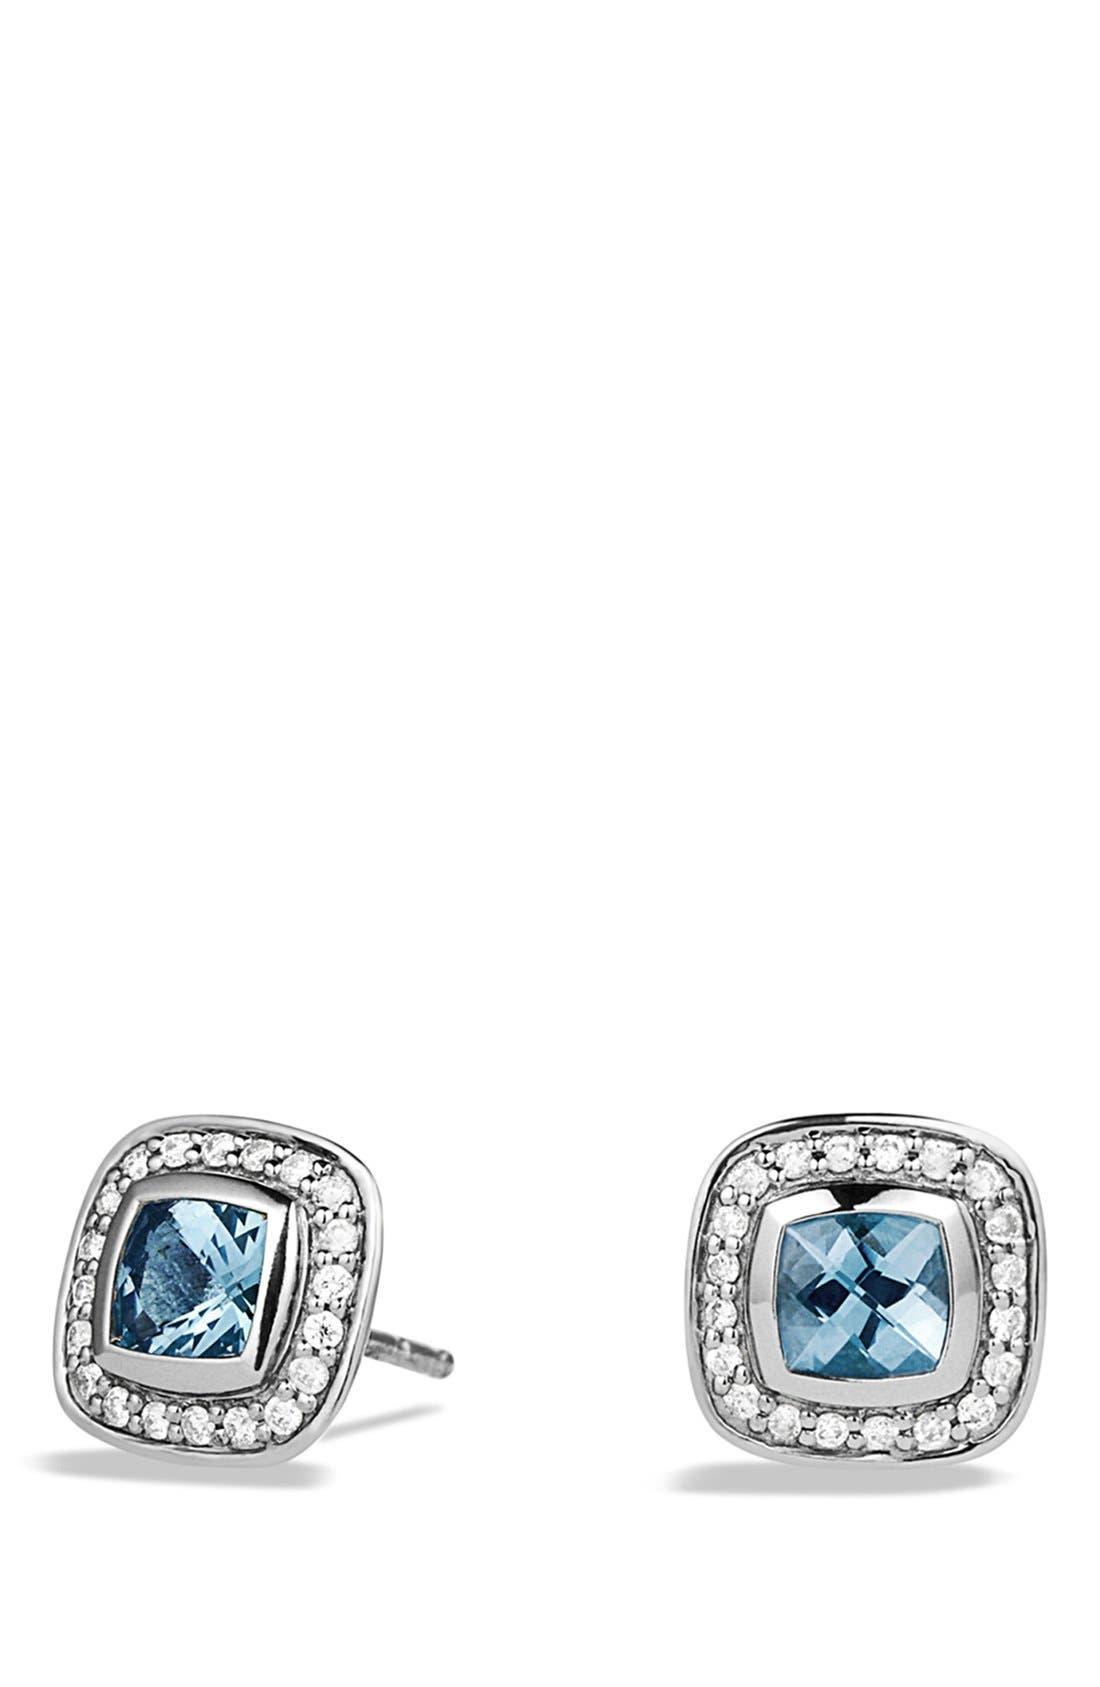 David Yurman 'Albion' Petite Earrings with Diamonds